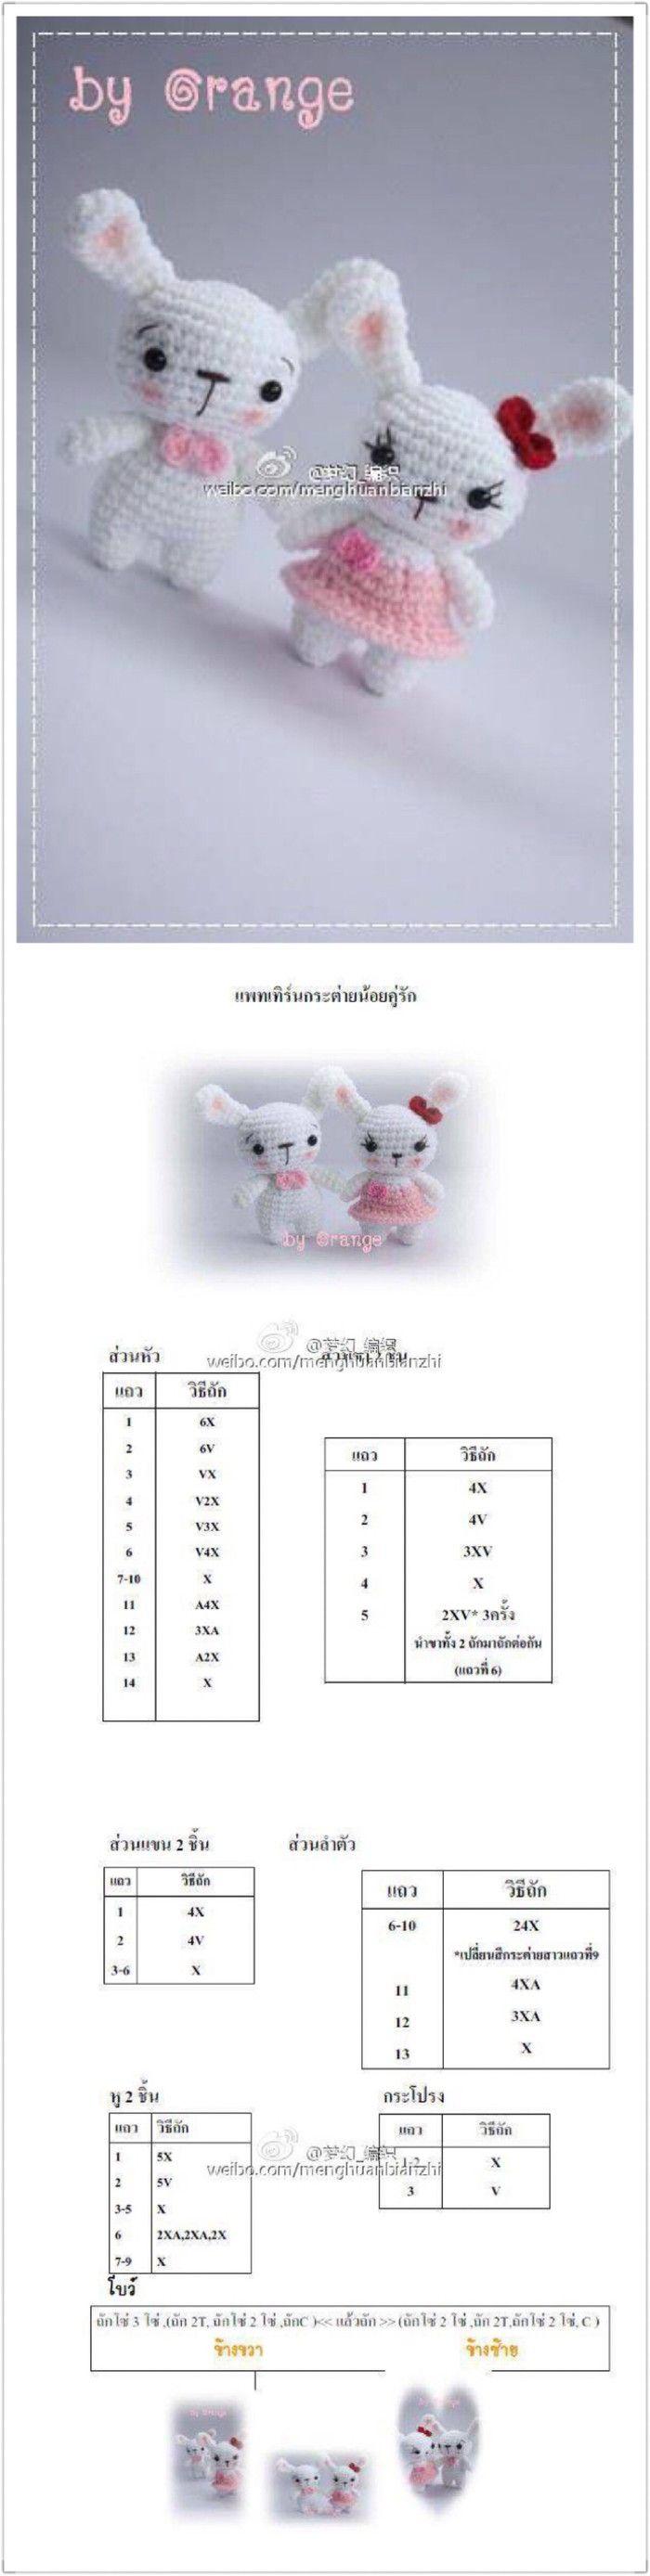 Pin de Kungking Yottarat en Pattern crochet free | Pinterest ...